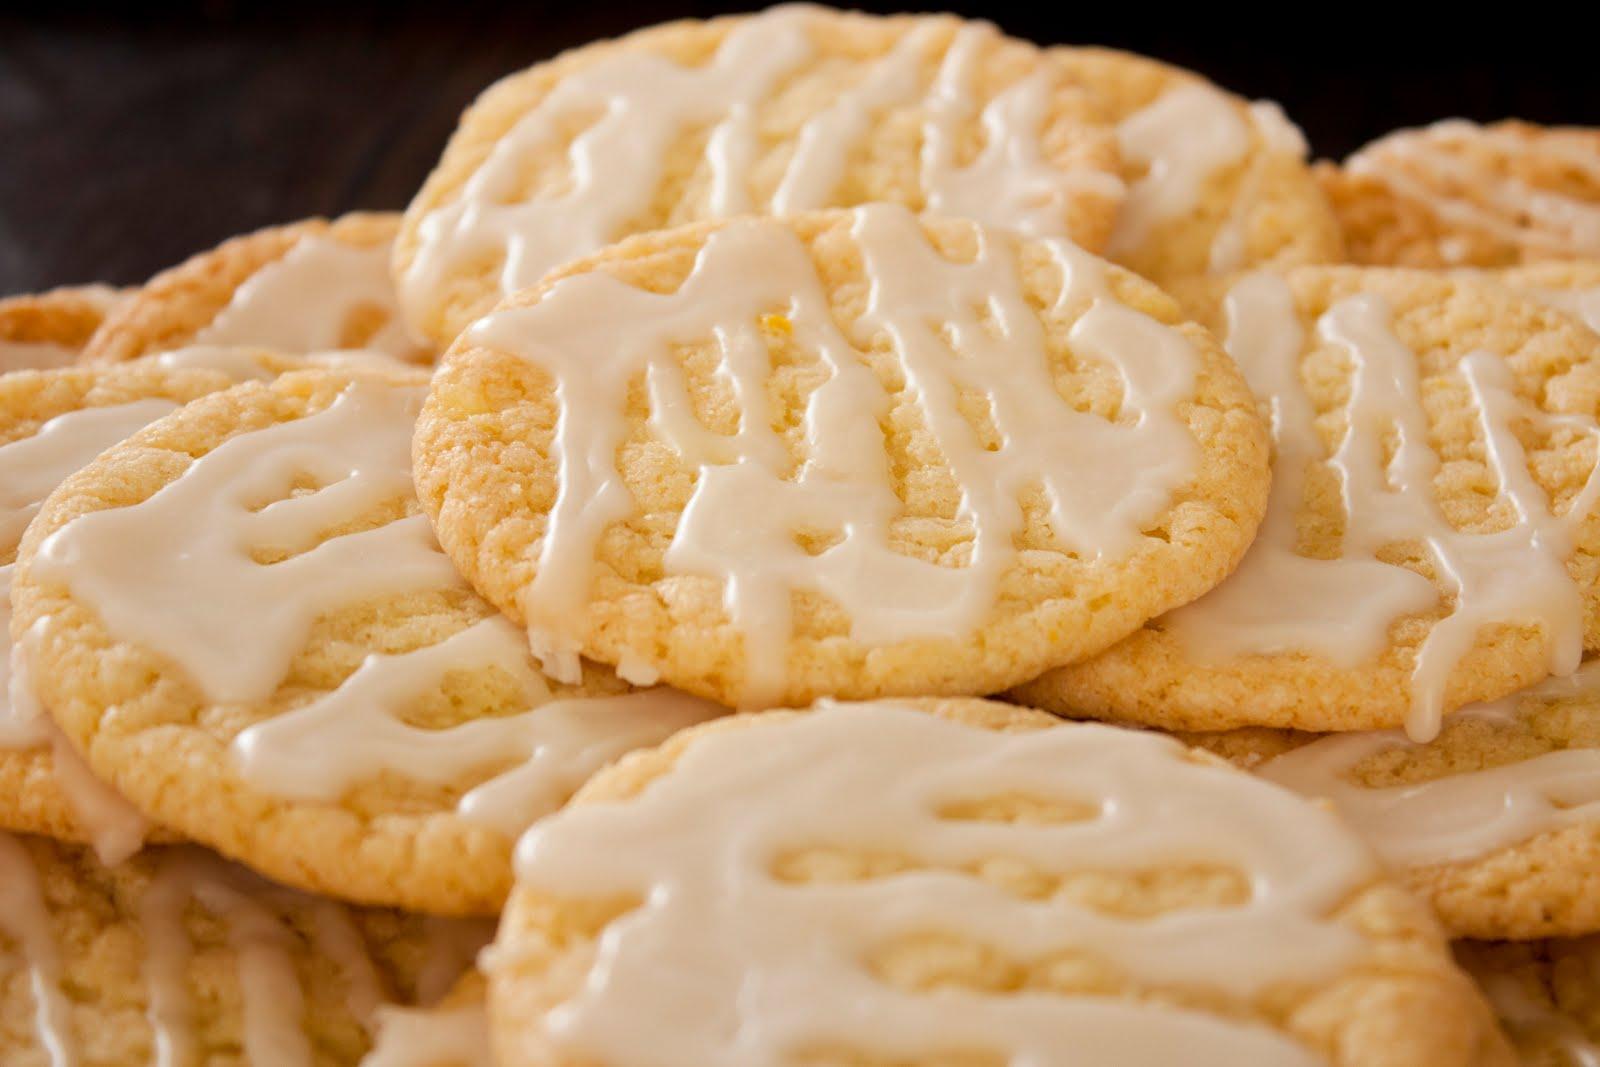 Our favorite recipes!: Lemon Drop Cookies